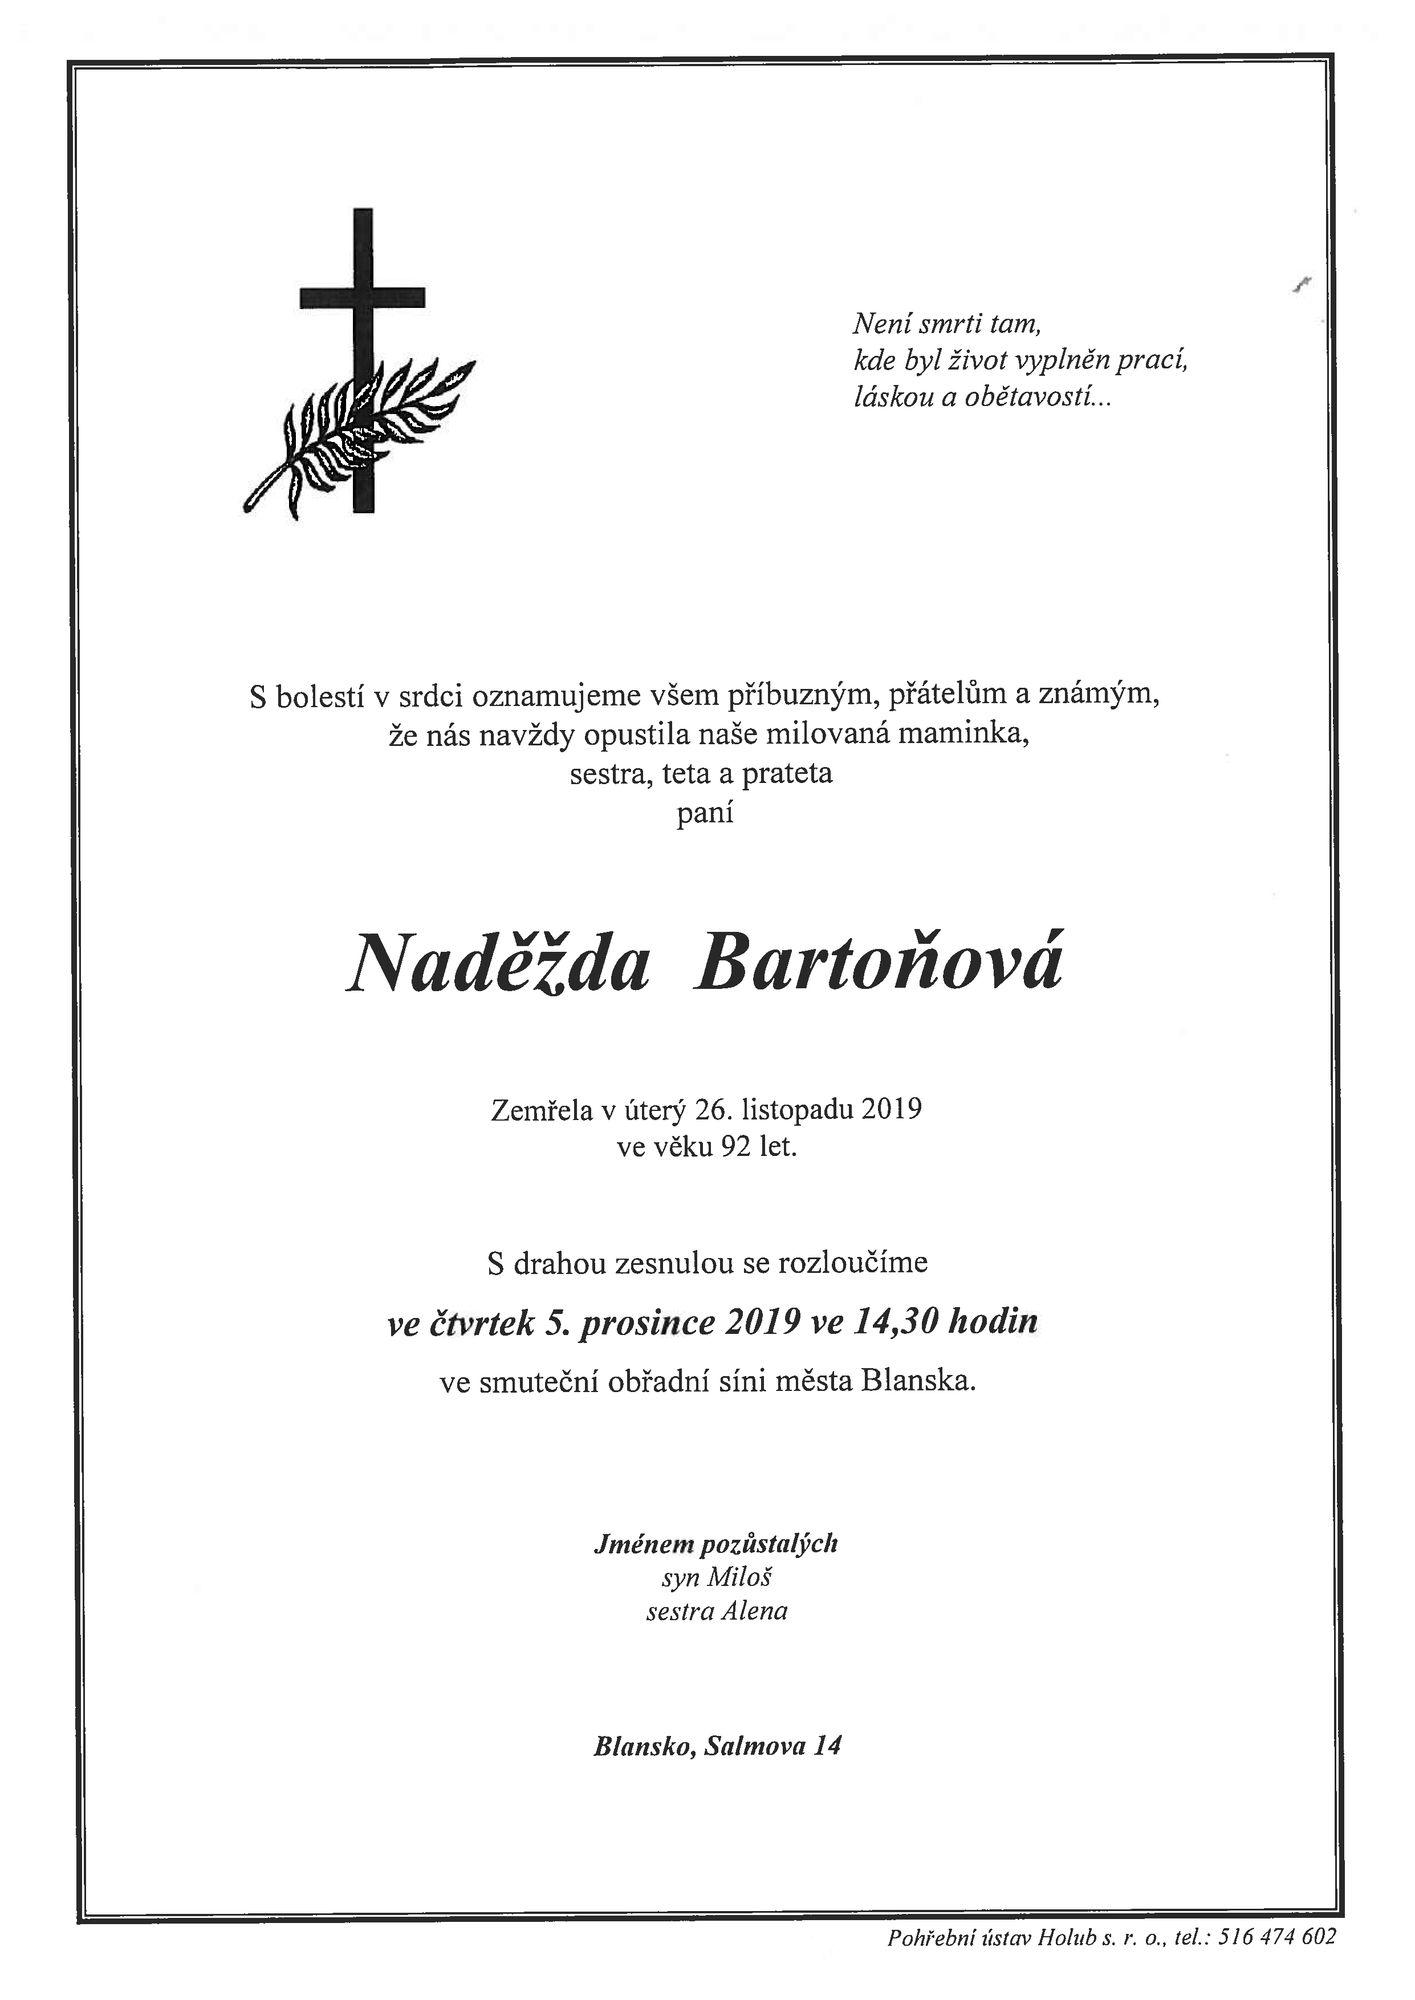 Naděžda Bartoňová